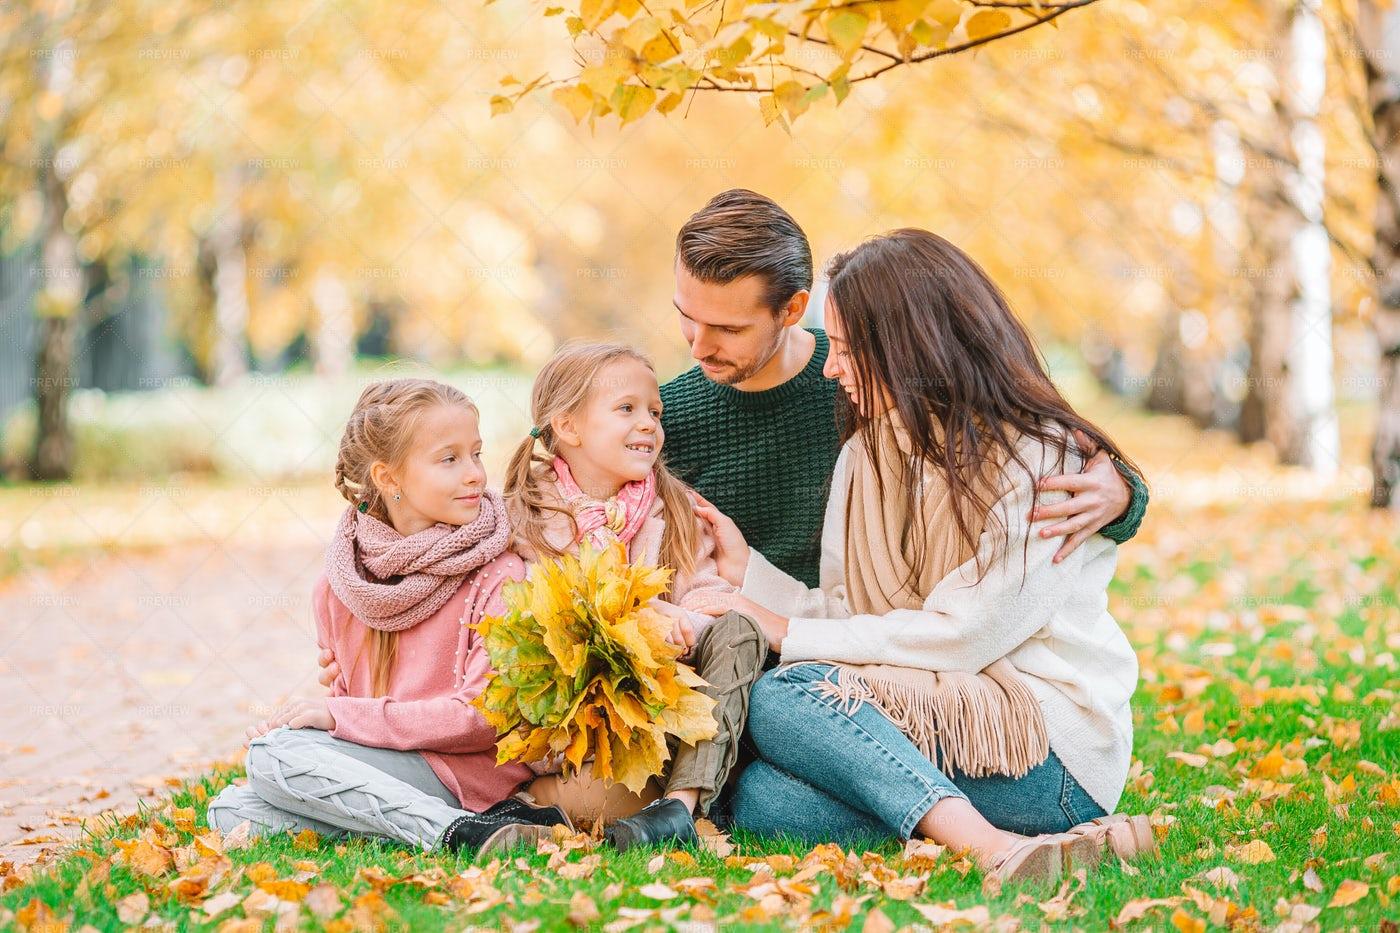 Family Of Four In Autumn Park: Stock Photos